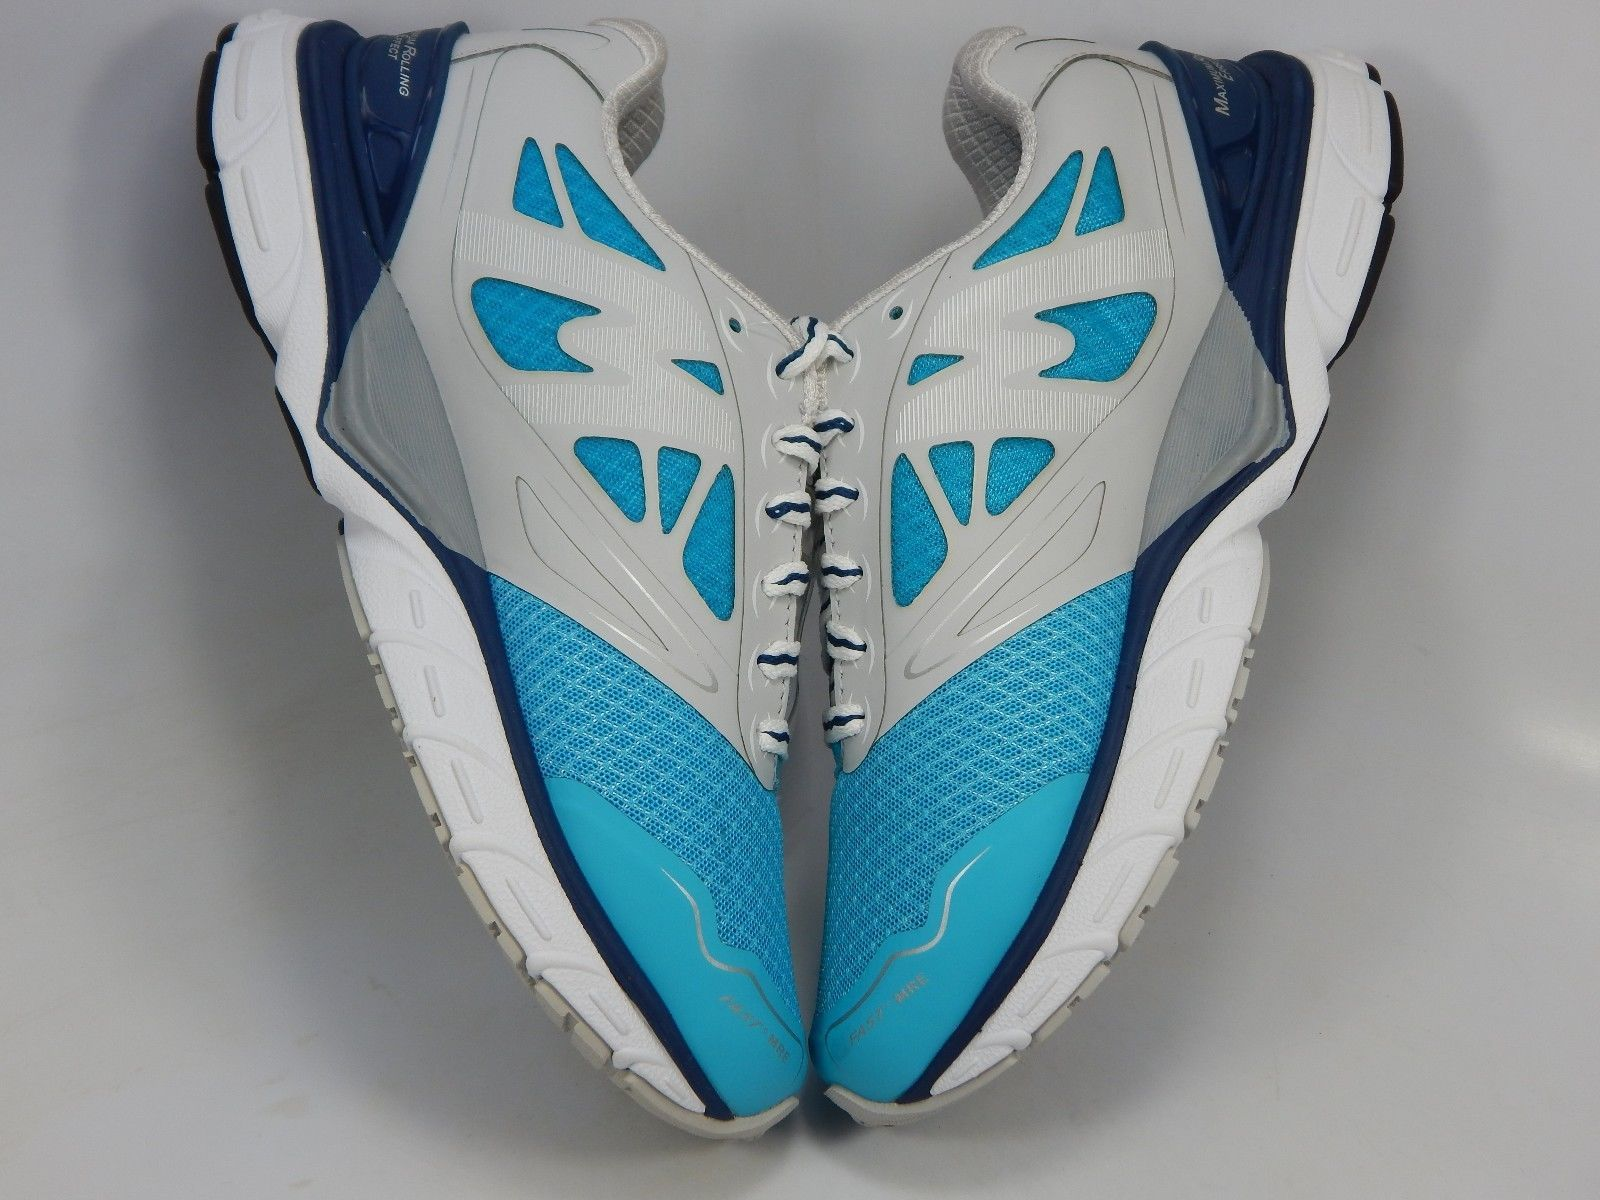 Karhu 2016 Fast 6 MRE Fulcrum Women's Running Shoes Size US 8 M (B) EU 39 Blue